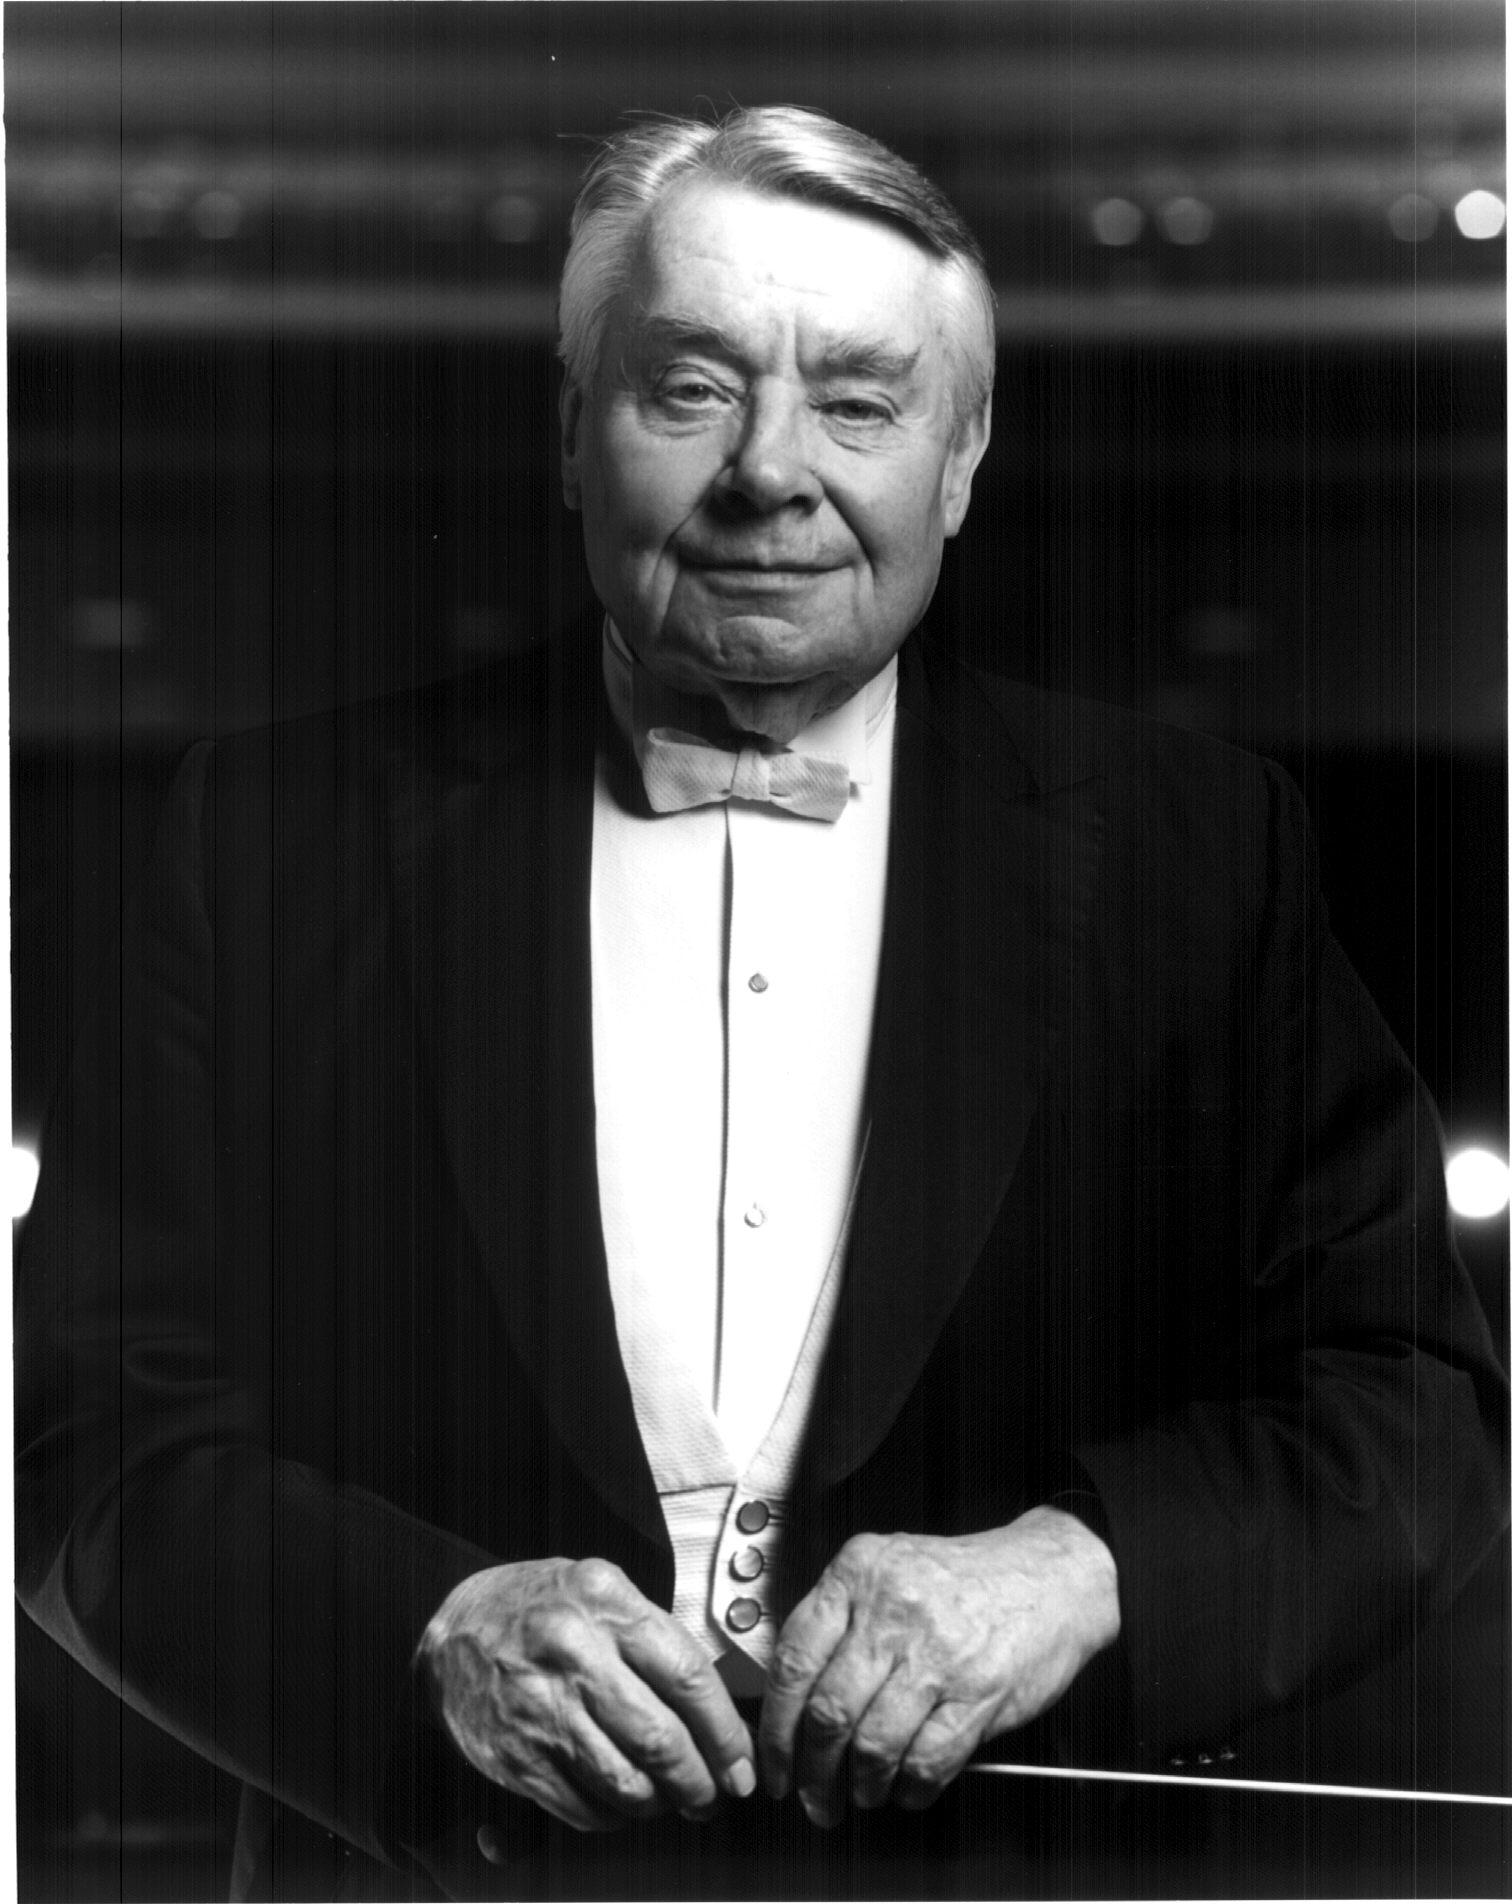 Robert-Shaw-Headshot-Courtesy-of-the-Atlanta-Symphony-Orchestra.jpg